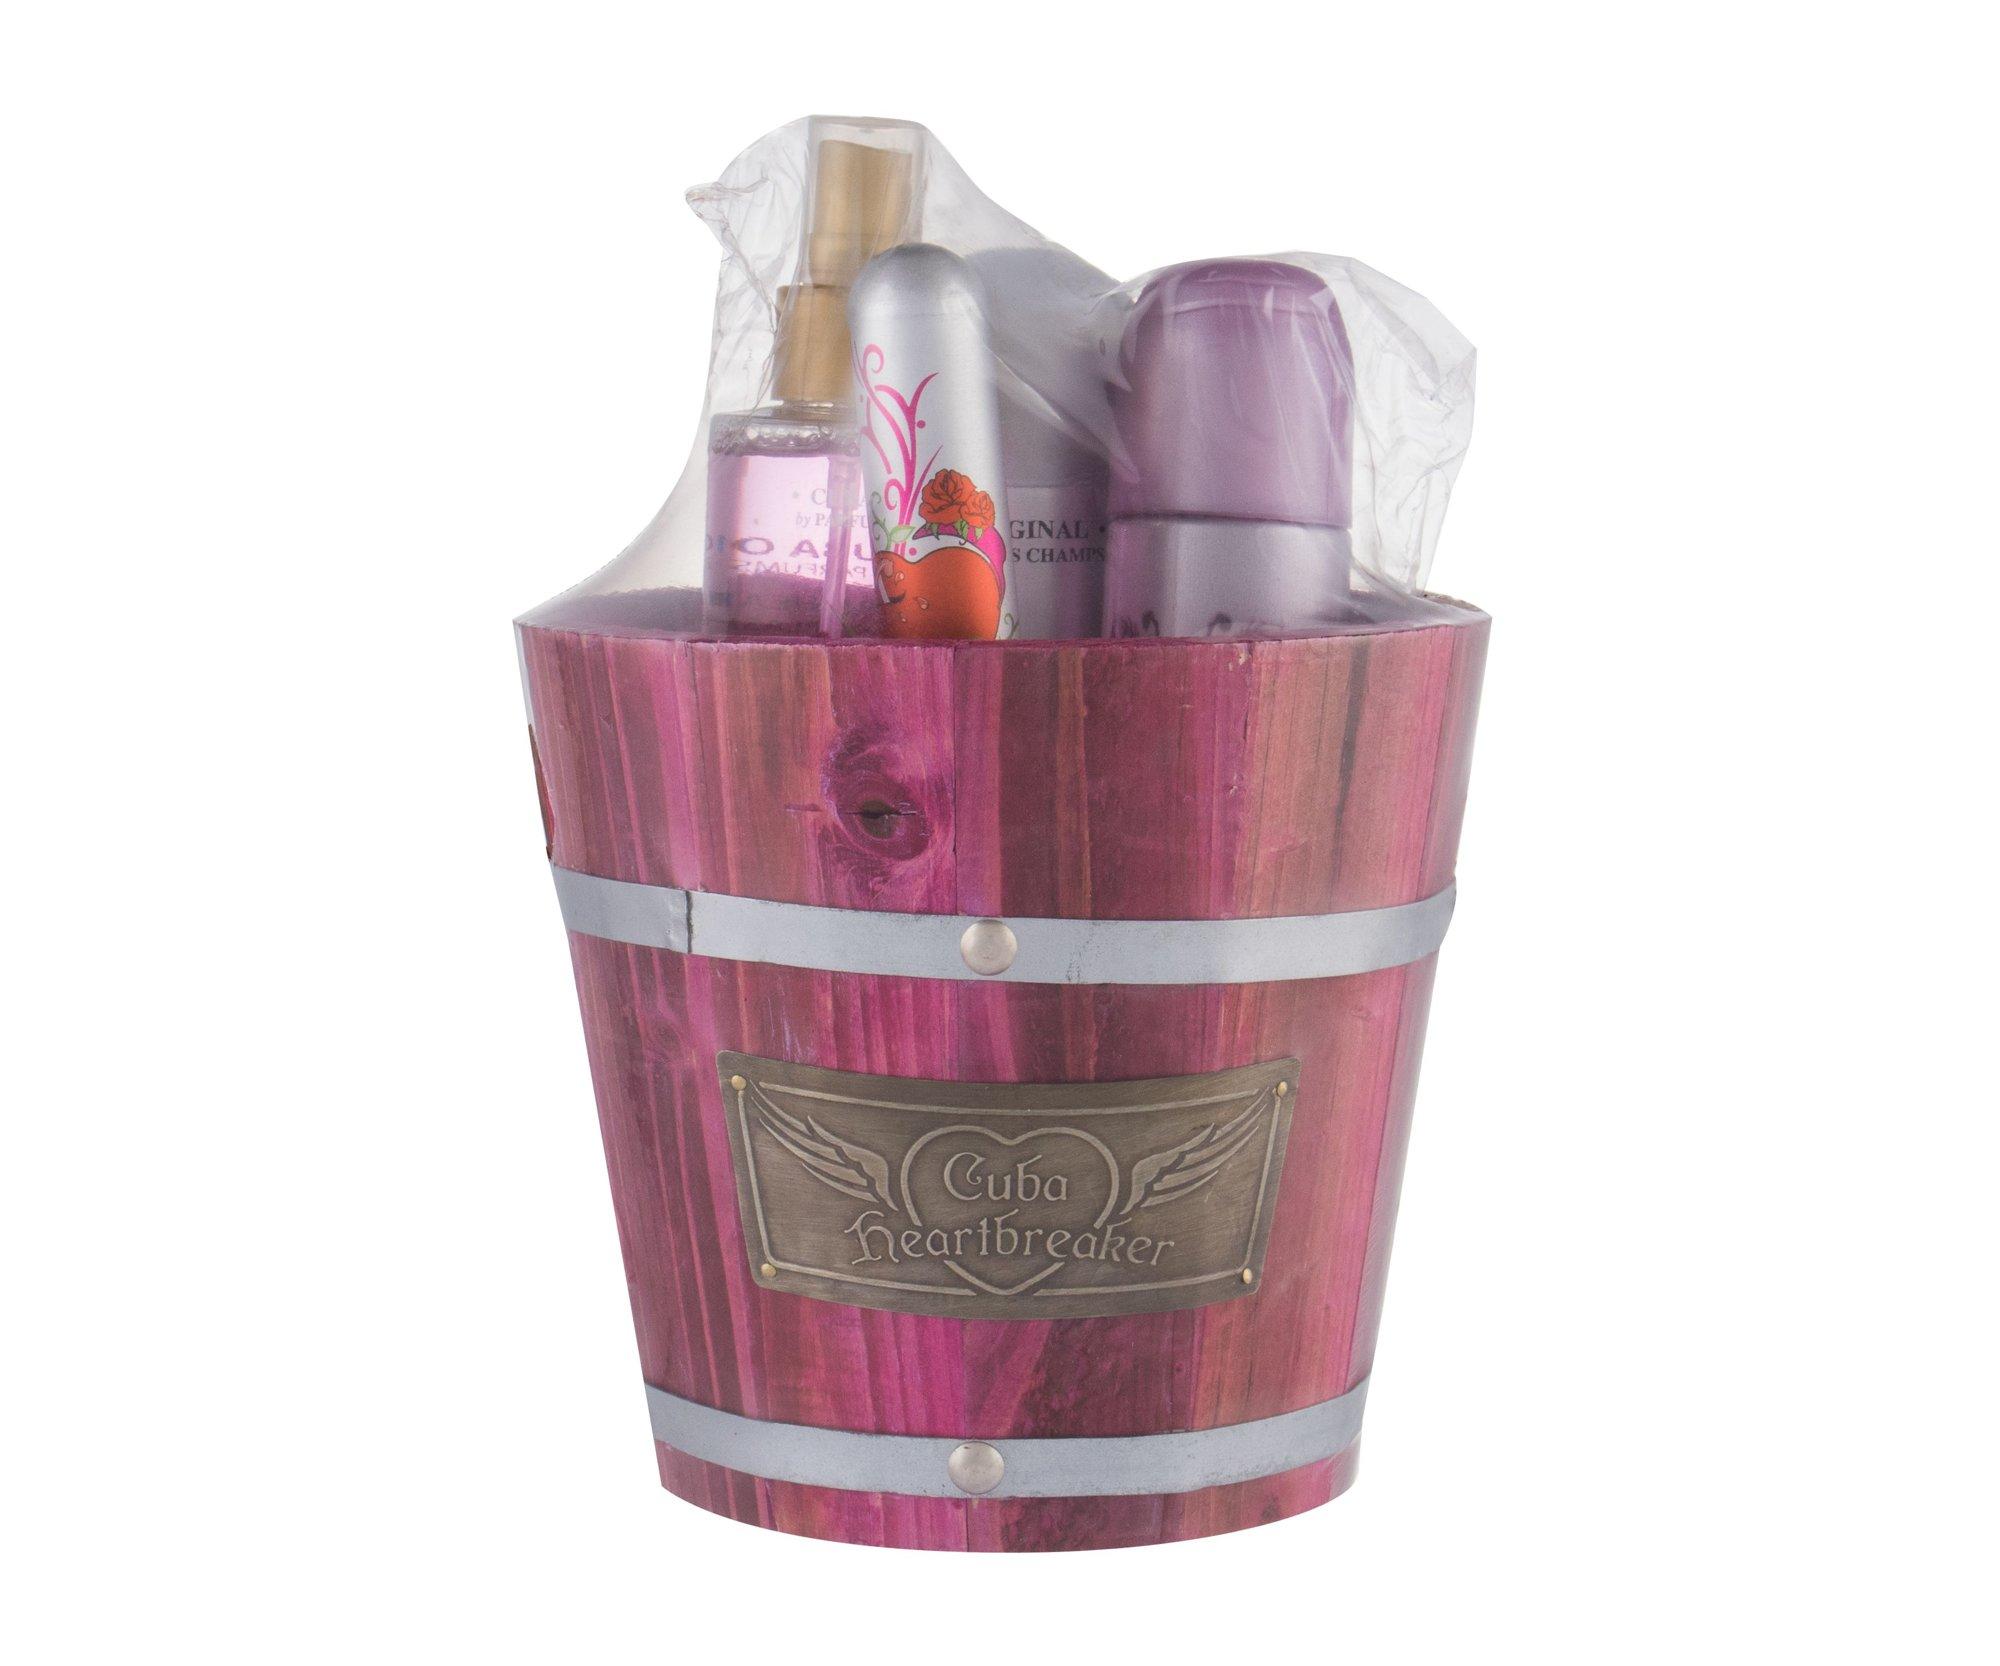 Cuba Heartbreaker Eau de Parfum 100ml